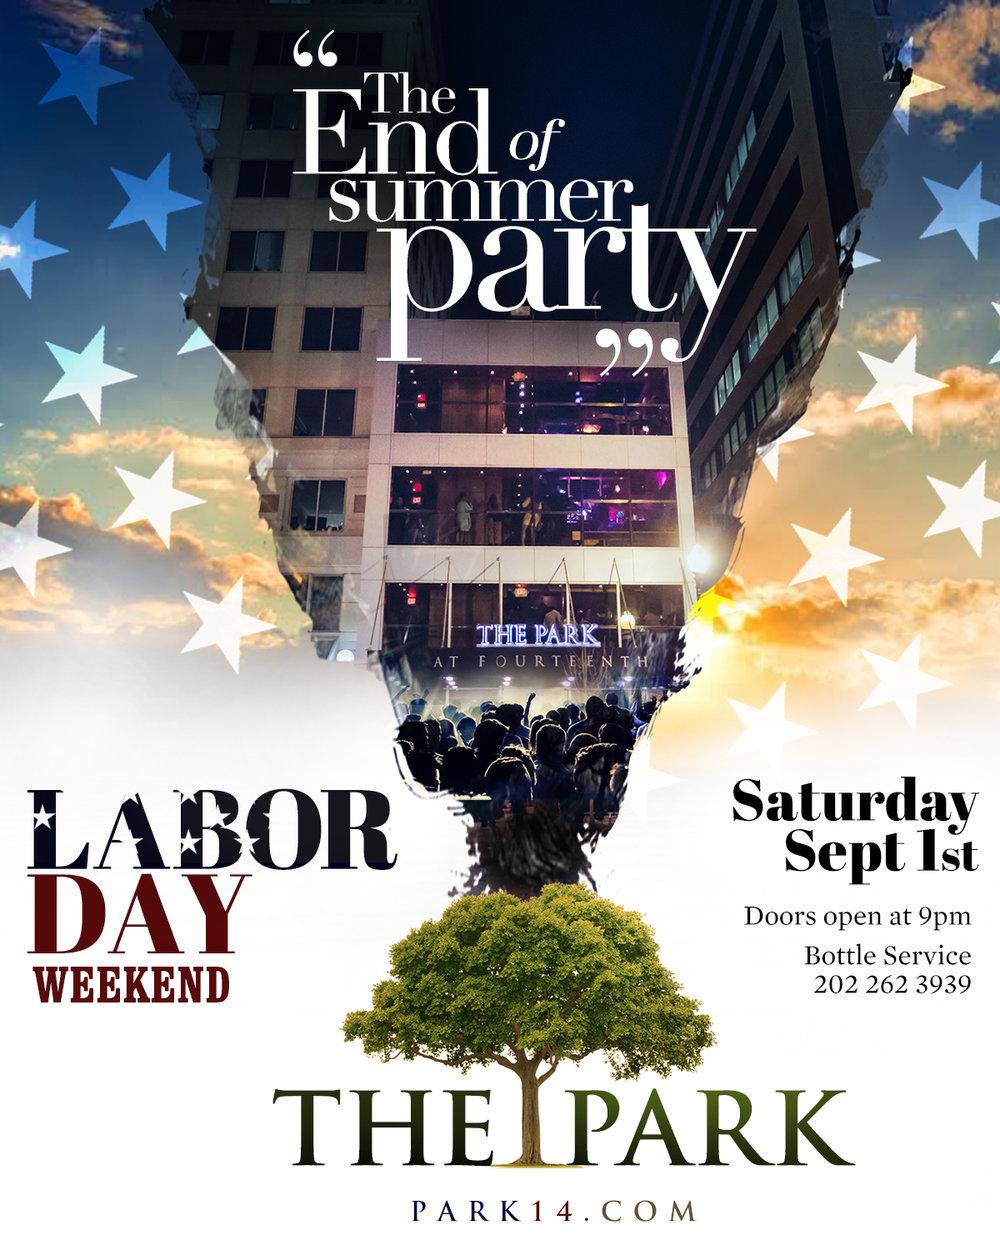 Saturday Labor Day 2018 Flyer v4.jpg